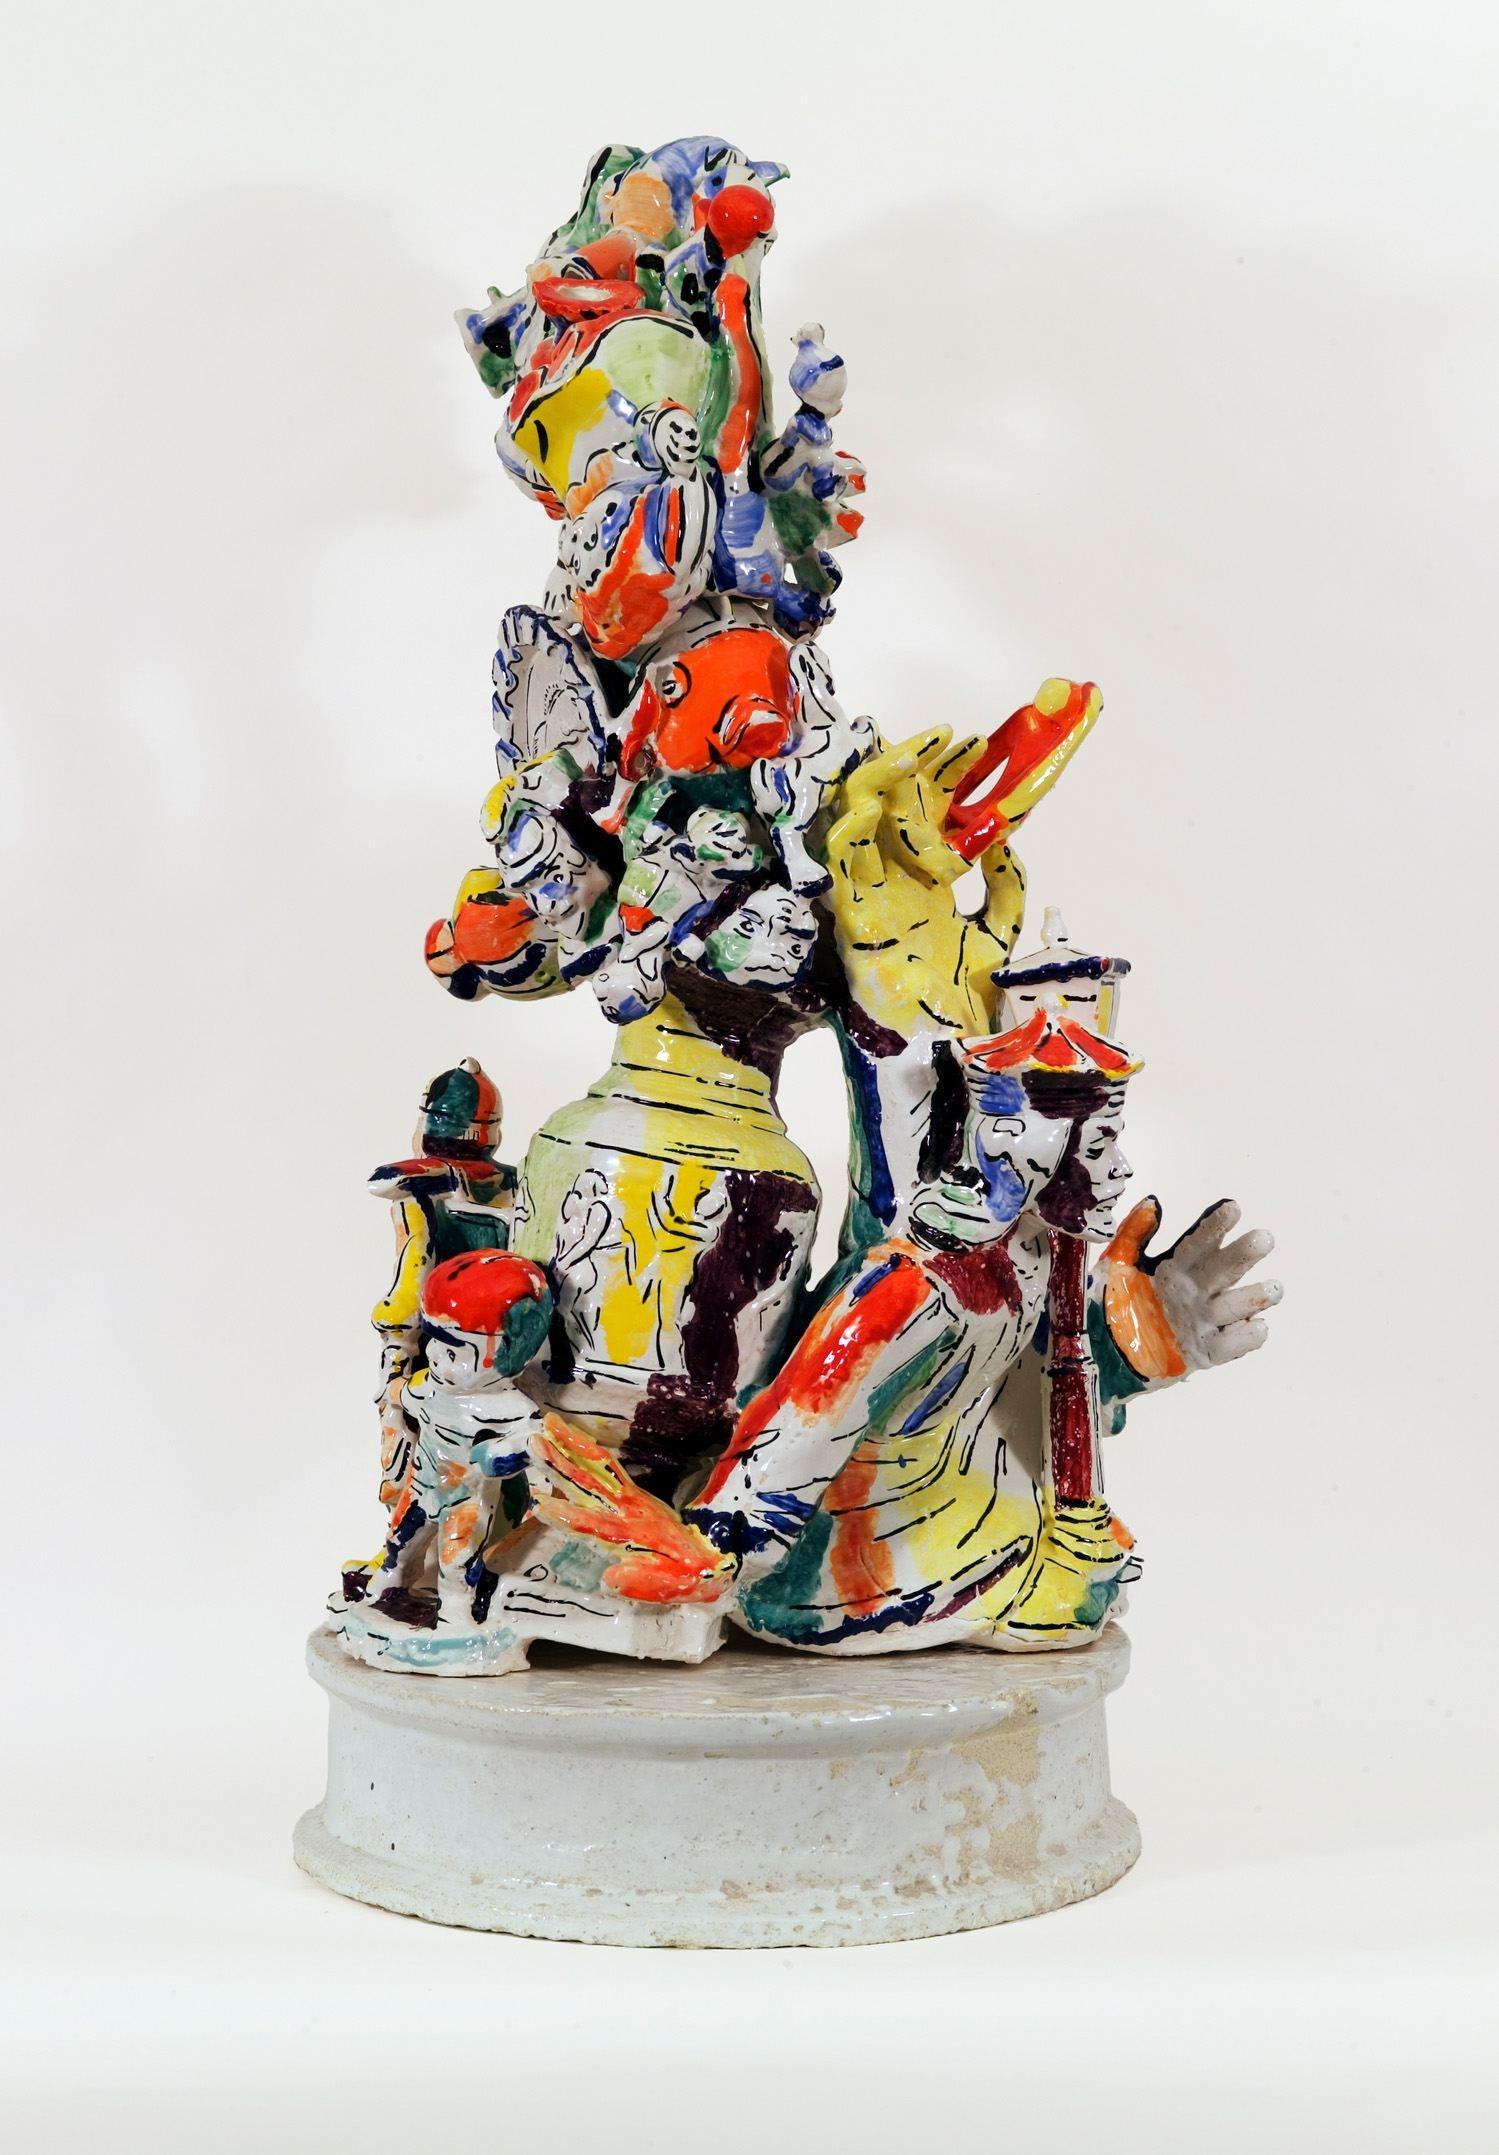 Viola Frey, Western Civilization: Urn, Had with Monkey and Figurines 1999 44 x 23 x 20 inches